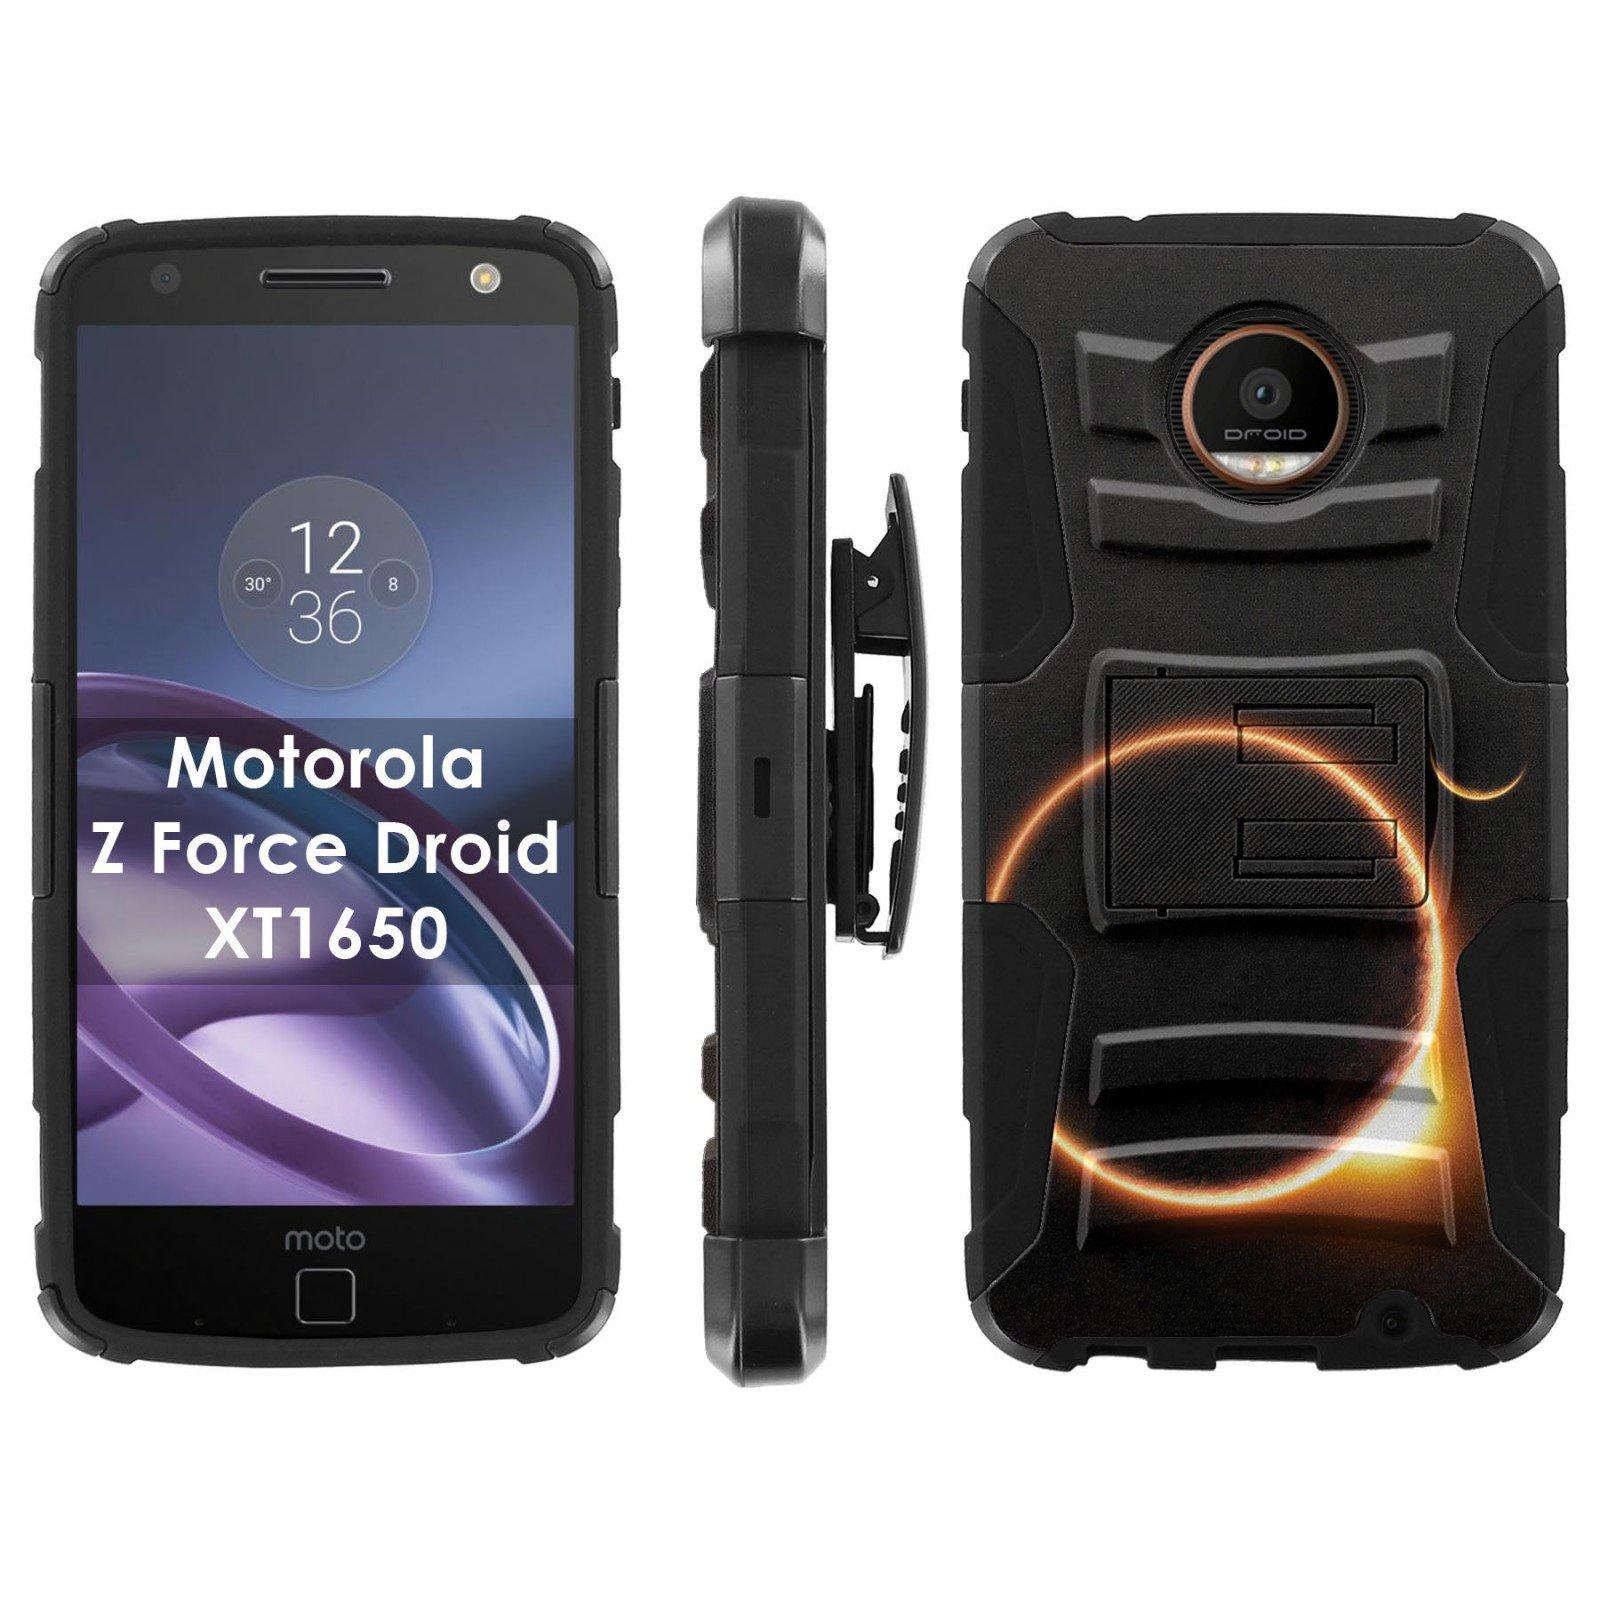 Motorola Moto [Z Force] Droid Phone Cover, Solar Eclipse- Black Blitz Hybrid Armor Phone Case for [Motorola Moto [Z Force] Droid] with [Kickstand and Holster]